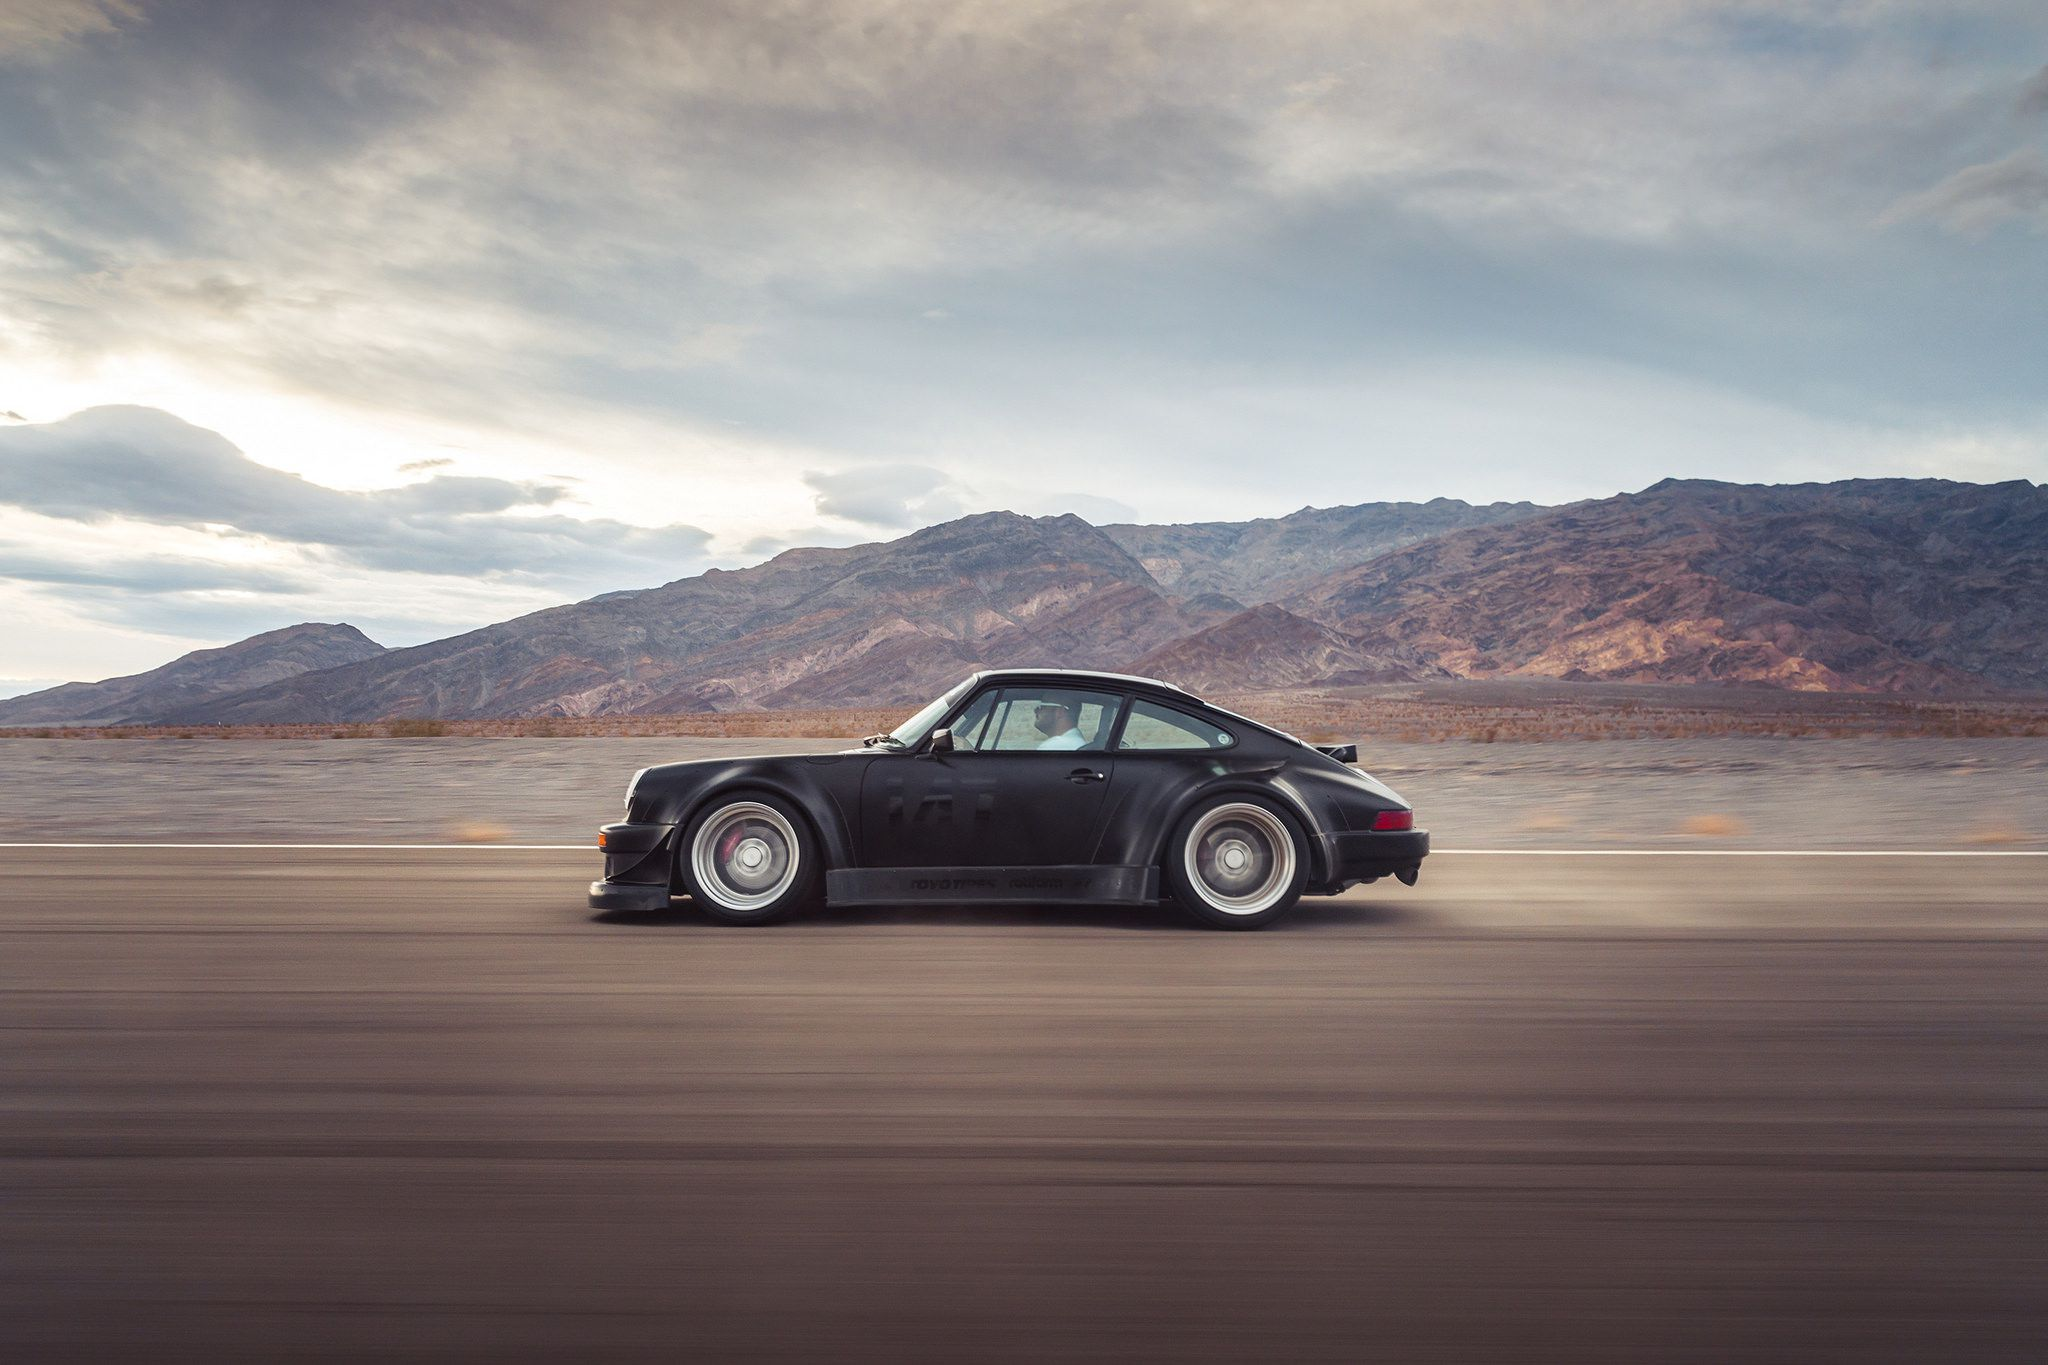 Black Widebody Sport Car On Rotiform Mlw Wheels Porsche 993 Wallpaper Hd 2048x1365 Wallpaper Teahub Io